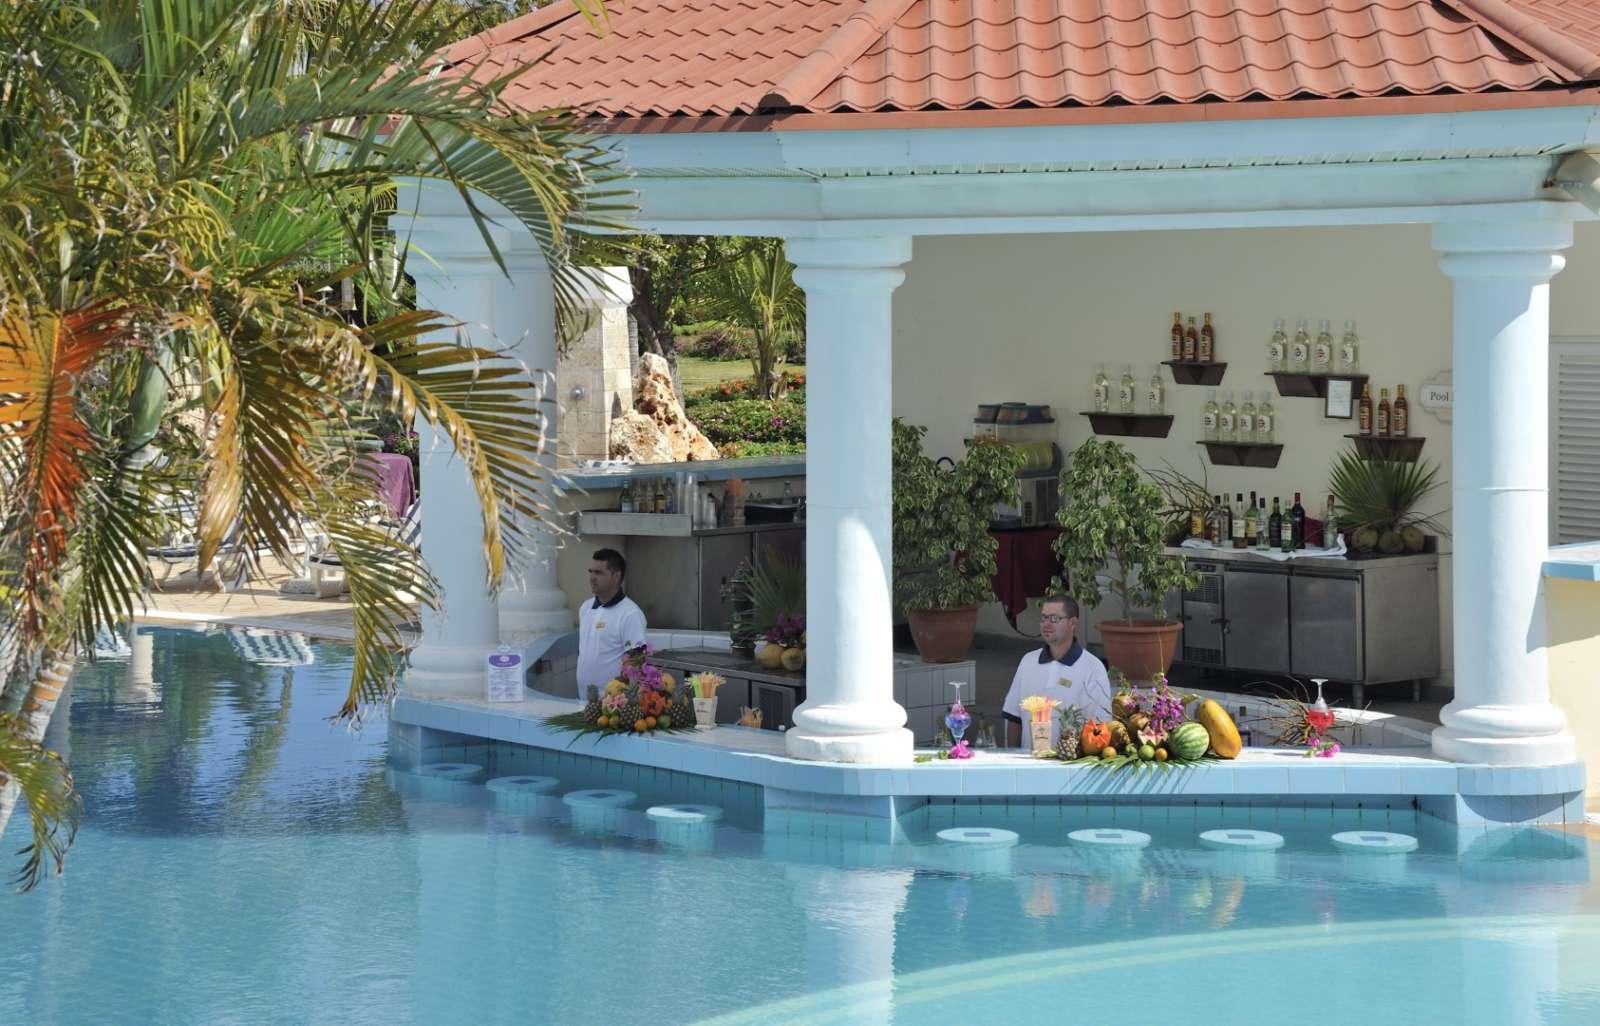 Swim up pool bar at Paradisus Princesa Varadero